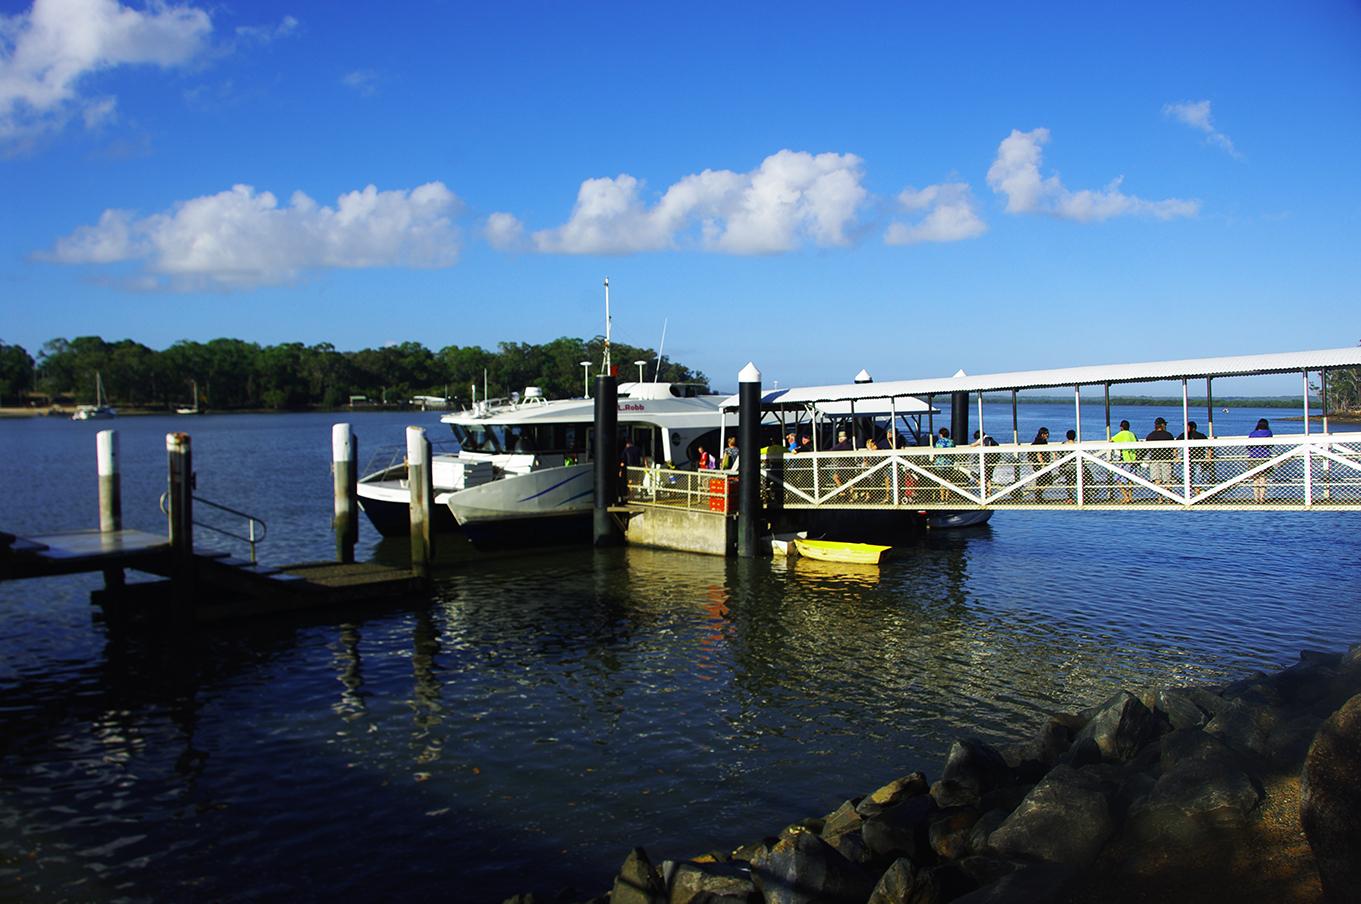 Macleay Island To Redland Bay Ferry